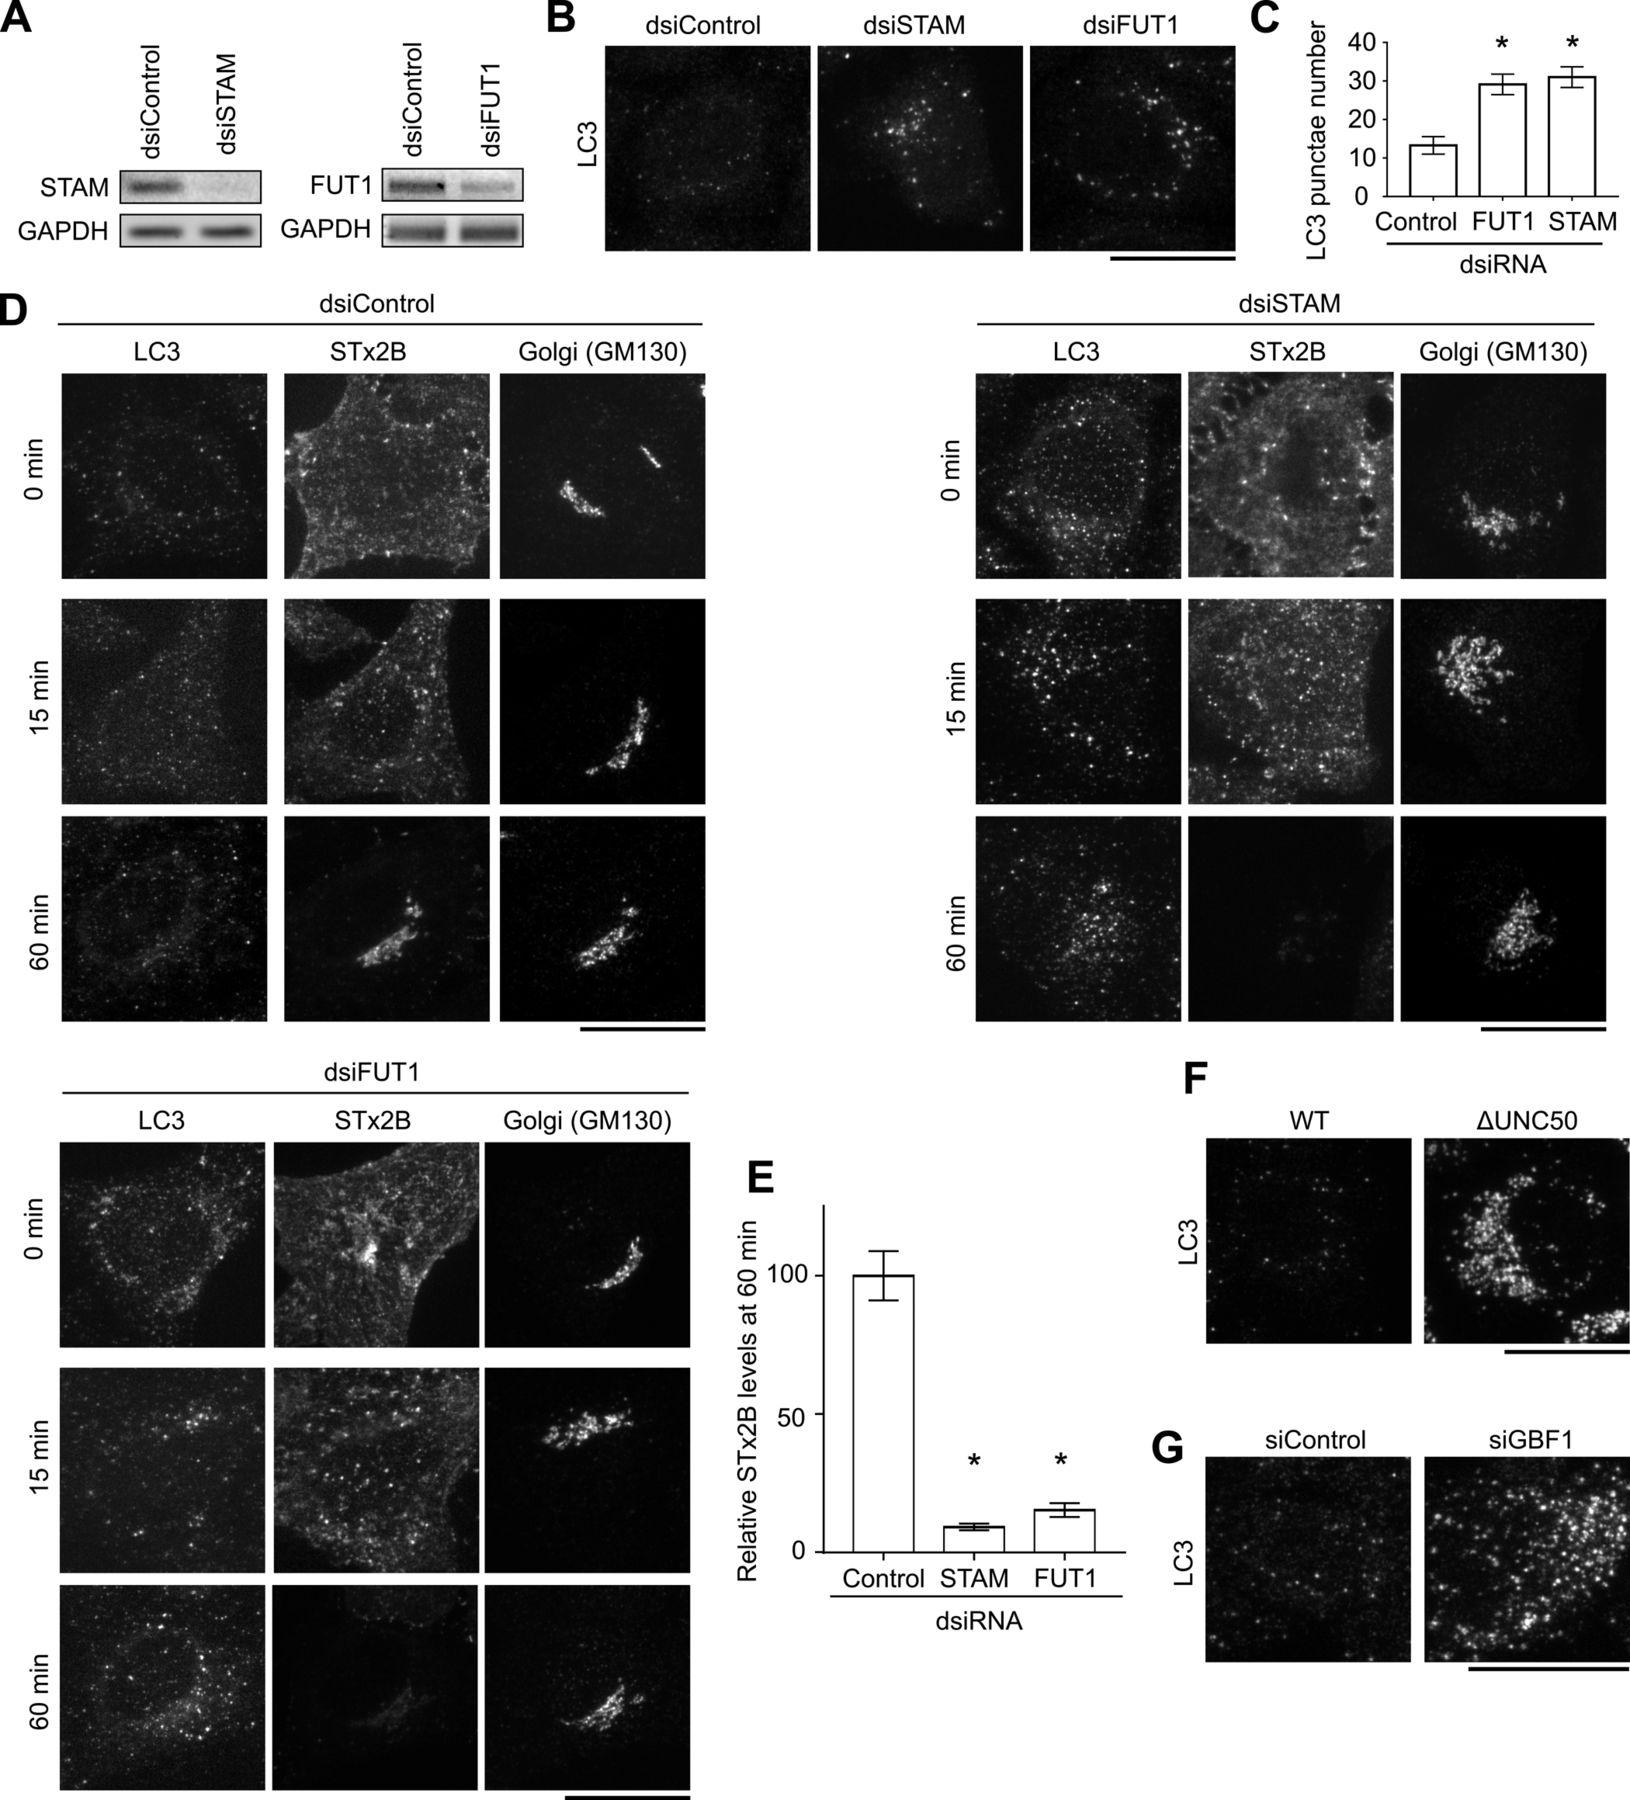 Tamoxifen blocks retrograde trafficking of Shiga toxin 1 and